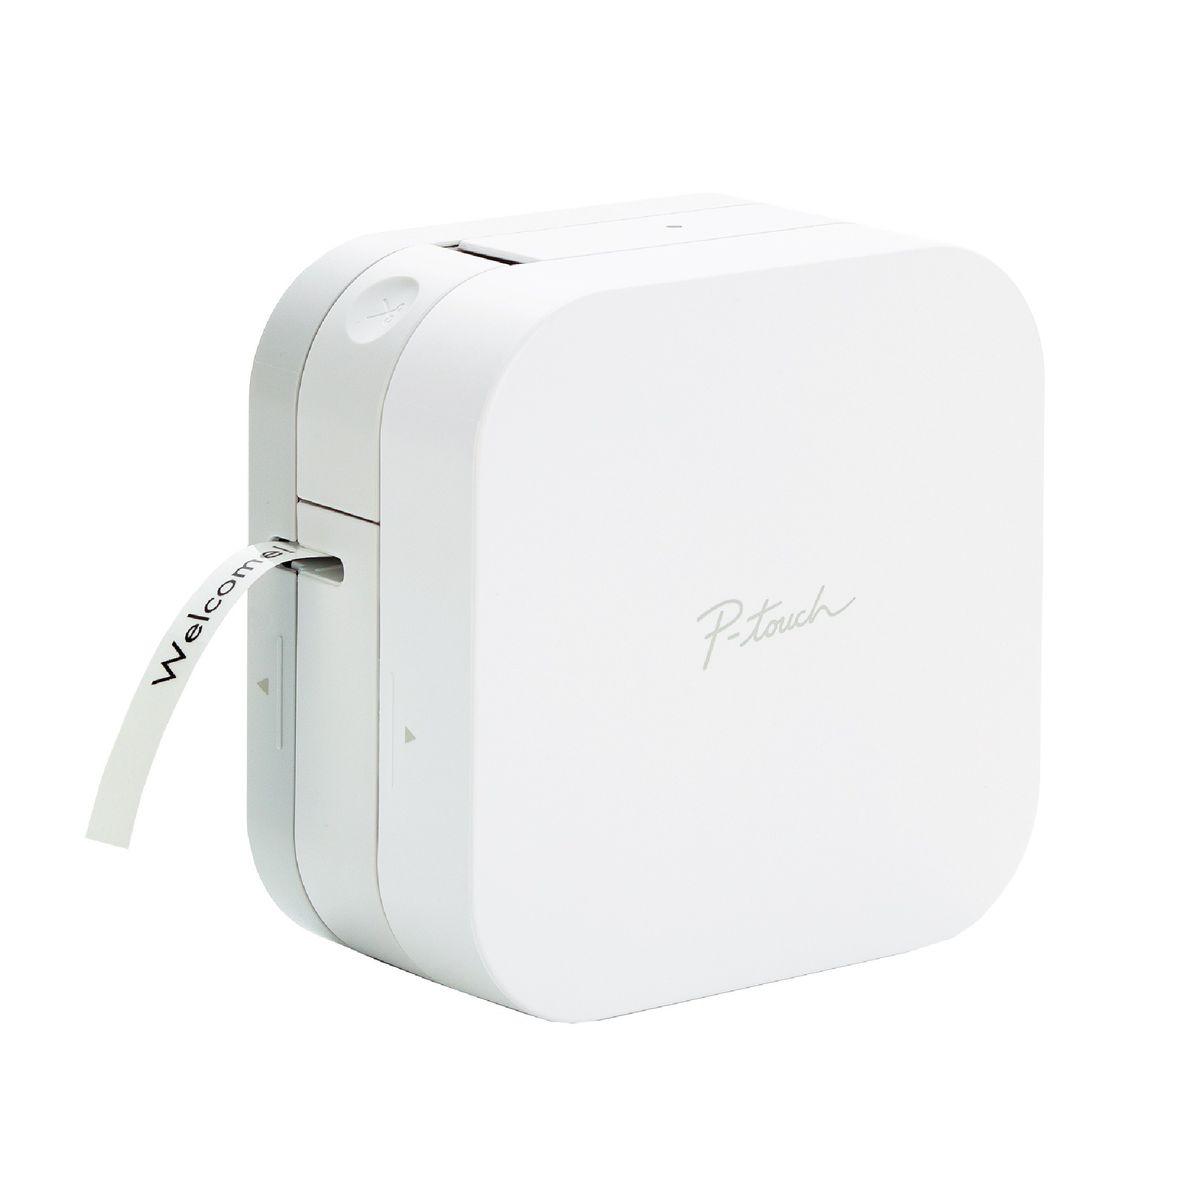 Printer Bluetooth Untuk Mokapos Bluetooth Transmitter For Tv Olx Bluetooth Car Adapter Currys Bluetooth Controller Unity Vr: Brother Pt-p300bt Bluetooth Label Printer